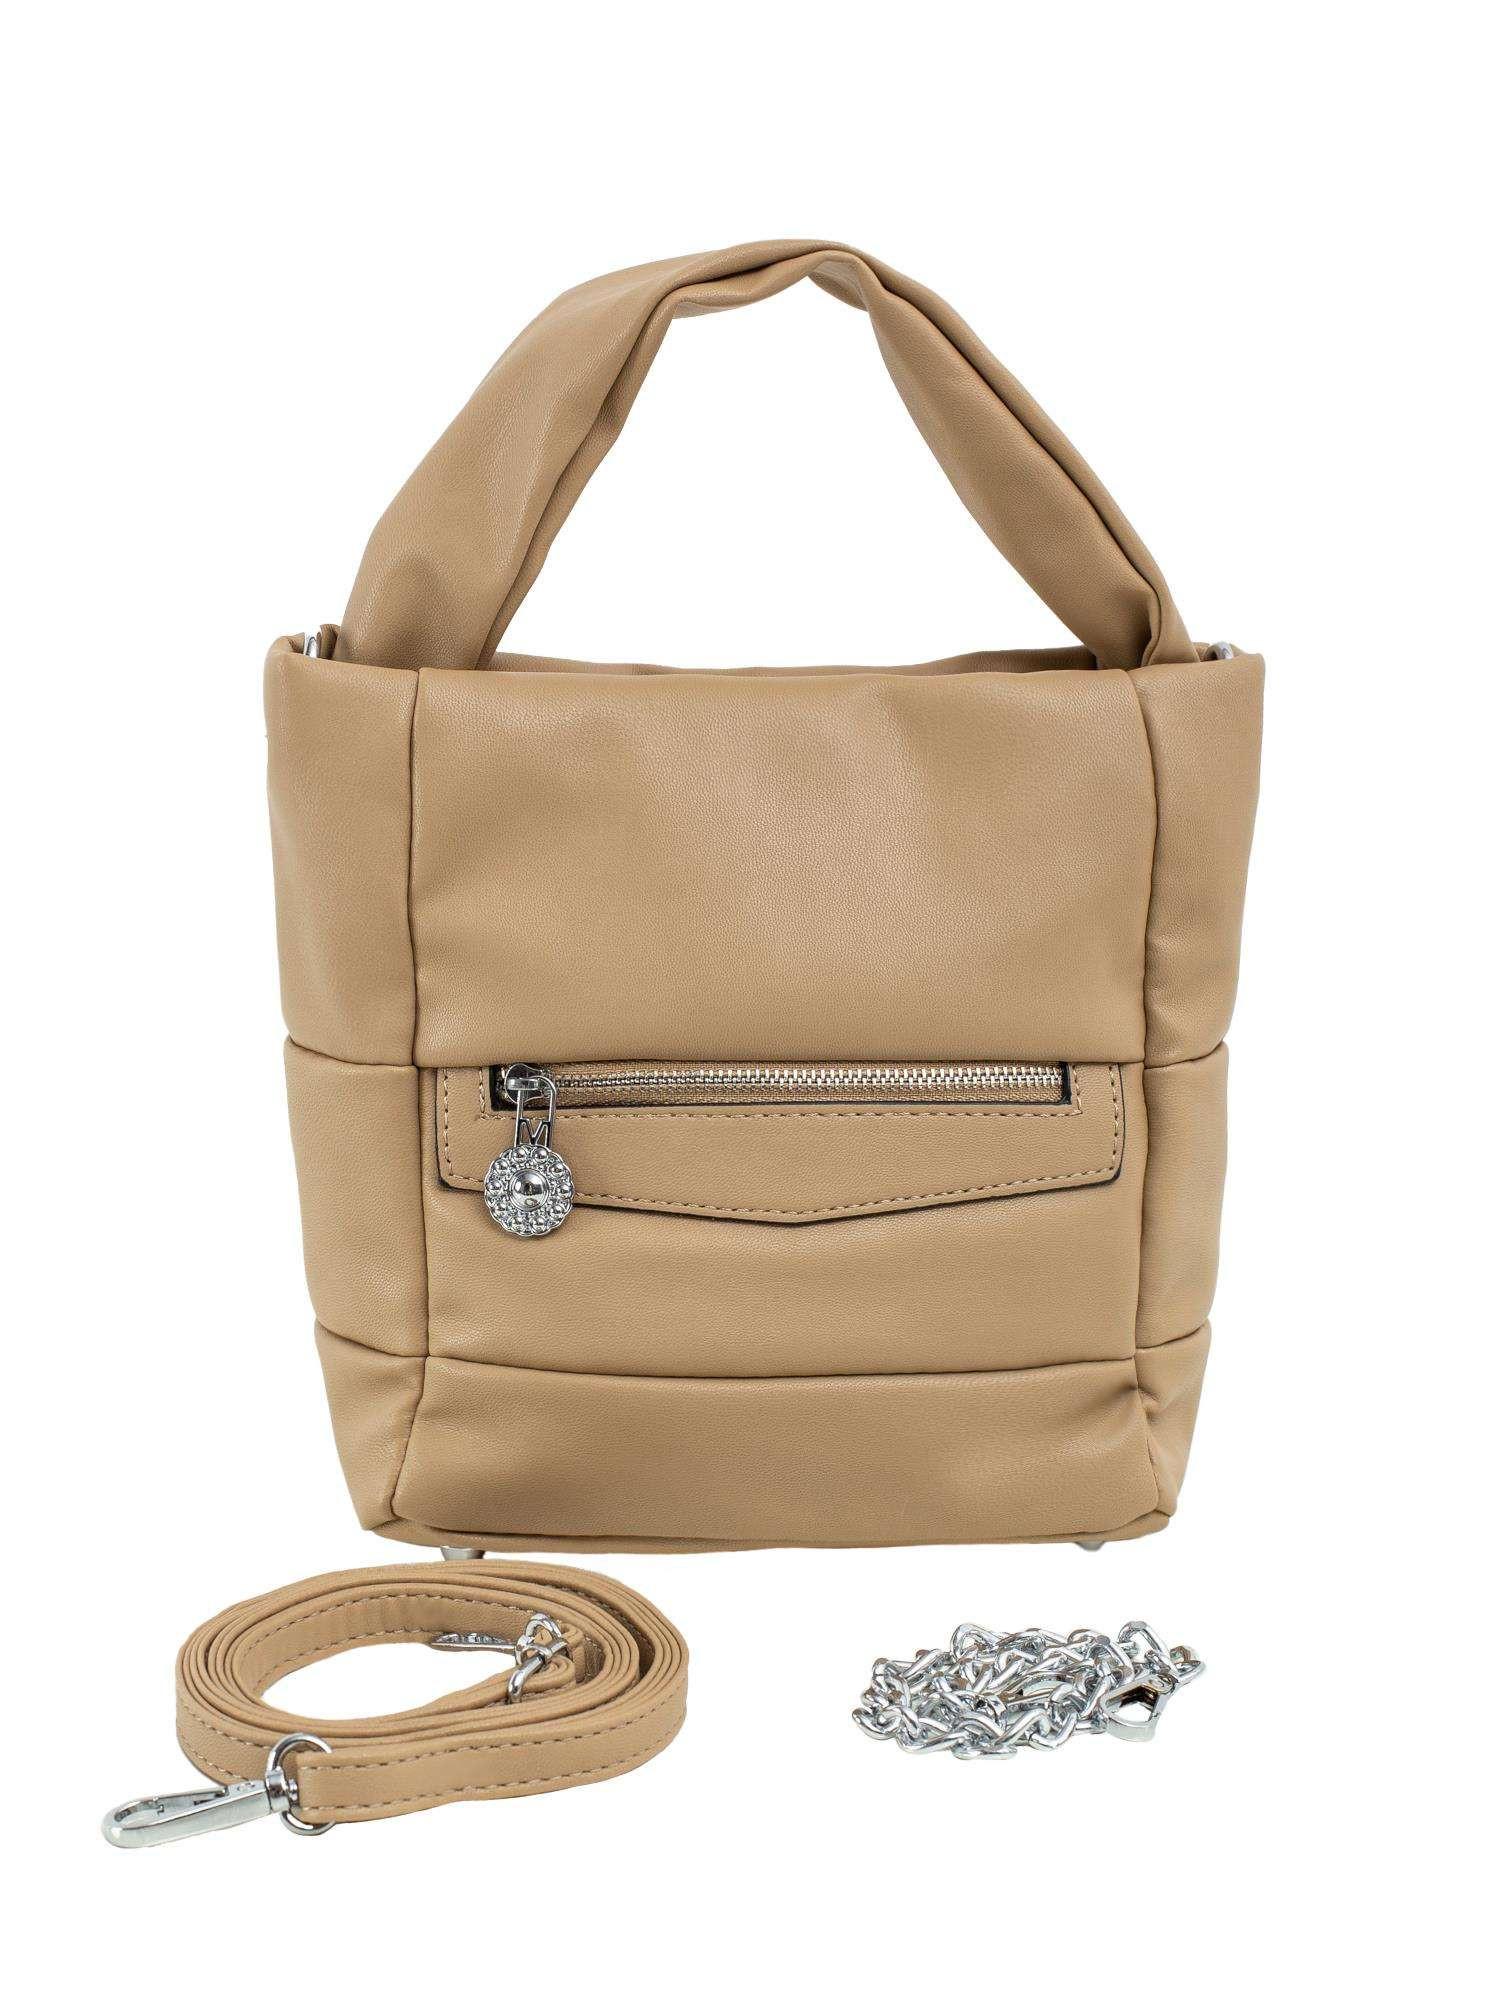 Béžová dámska kabelka vyrobená z ekologickej kože ONE SIZE